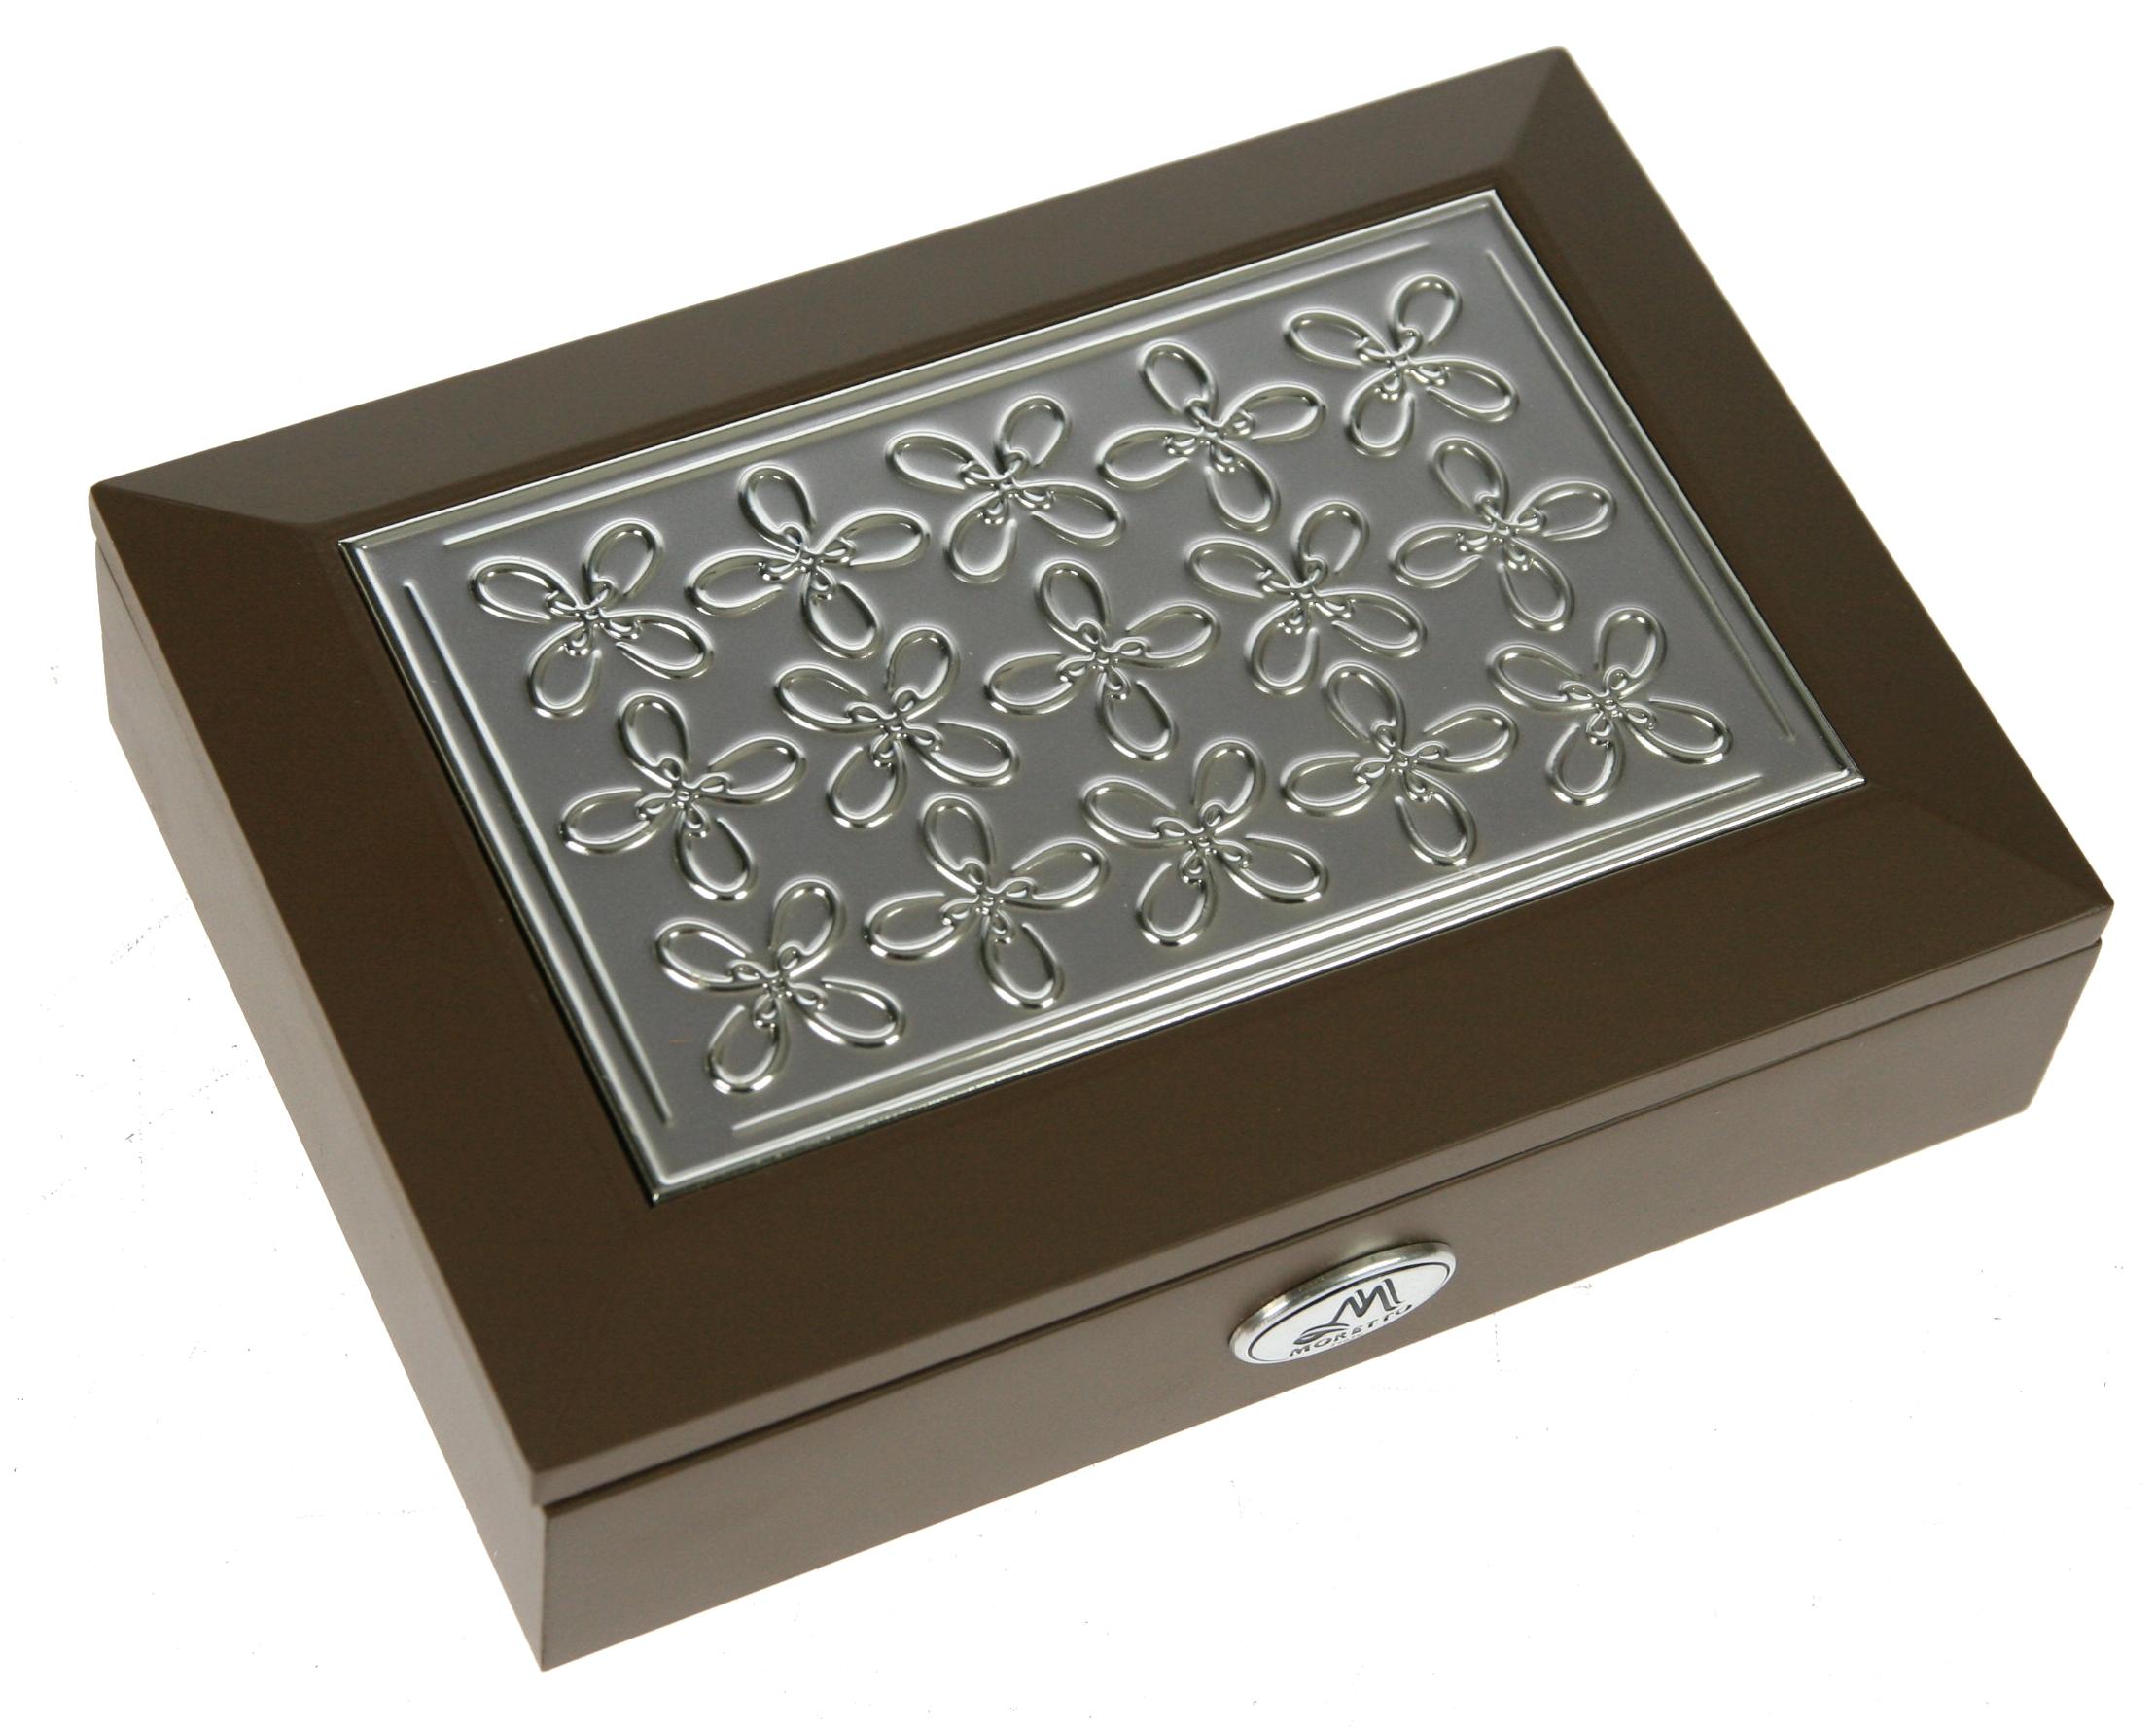 Шкатулка для ювелирных украшений Moretto, 18 х 13 х 5 см. 39941 шкатулка для ювелирных украшений moretto 18 х 13 х 5 см 139522